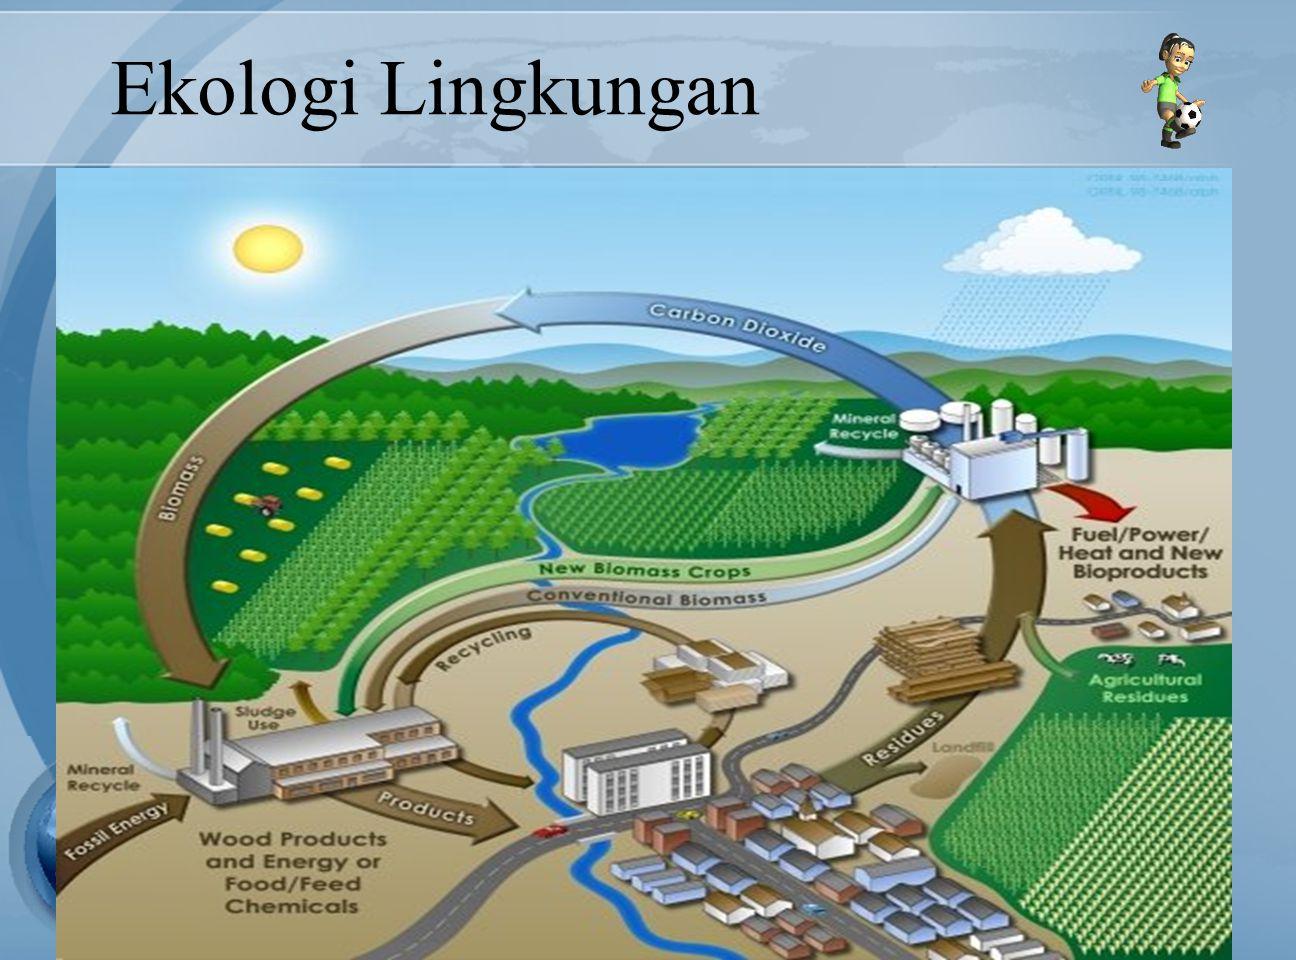 Ekologi Lingkungan